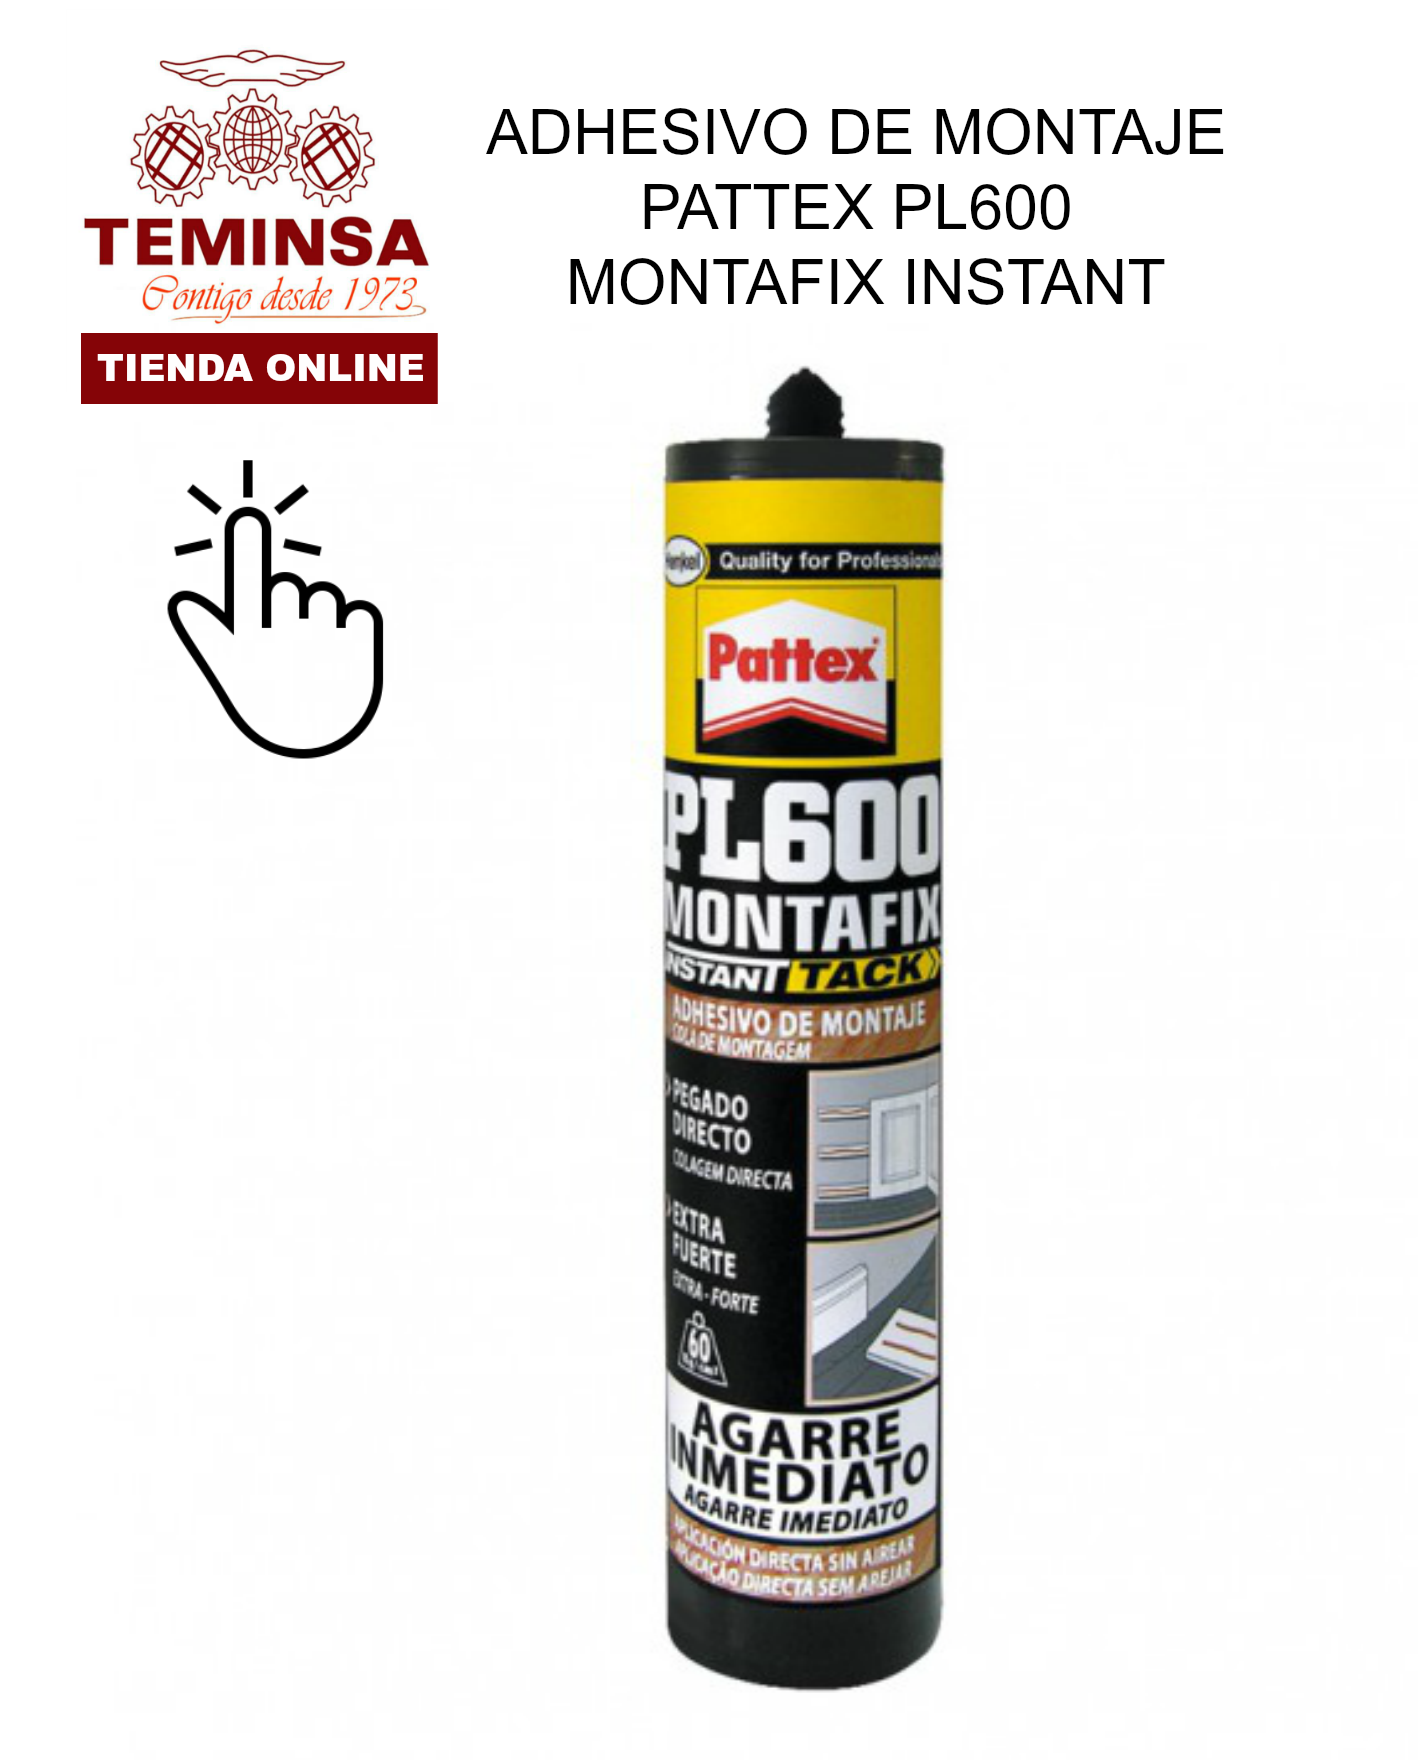 ADHESIVO DE MONTAJE PATTEX PL600 MONTAFIX INSTANT Teminsa Online